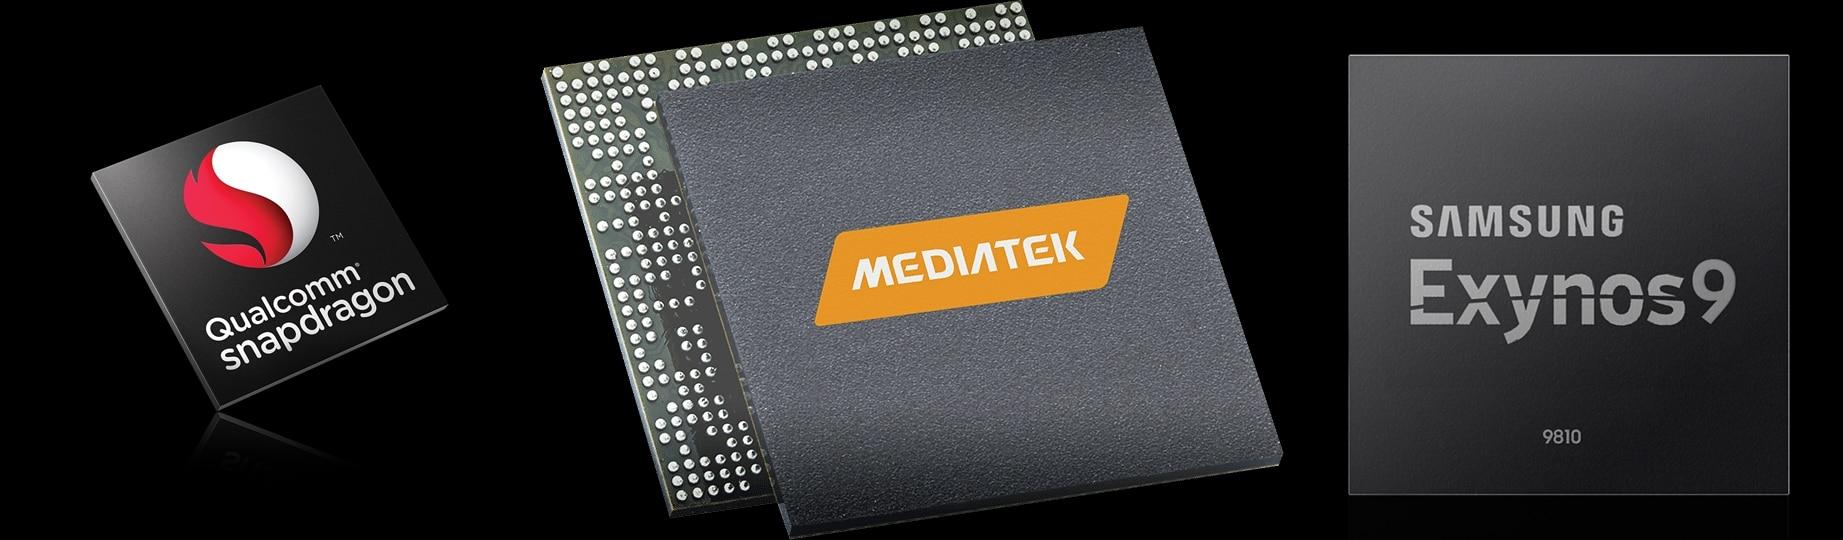 Logo Dari Prosesor Qualcomm Snapdragon, Mediatek, dan Samsung Exynos9